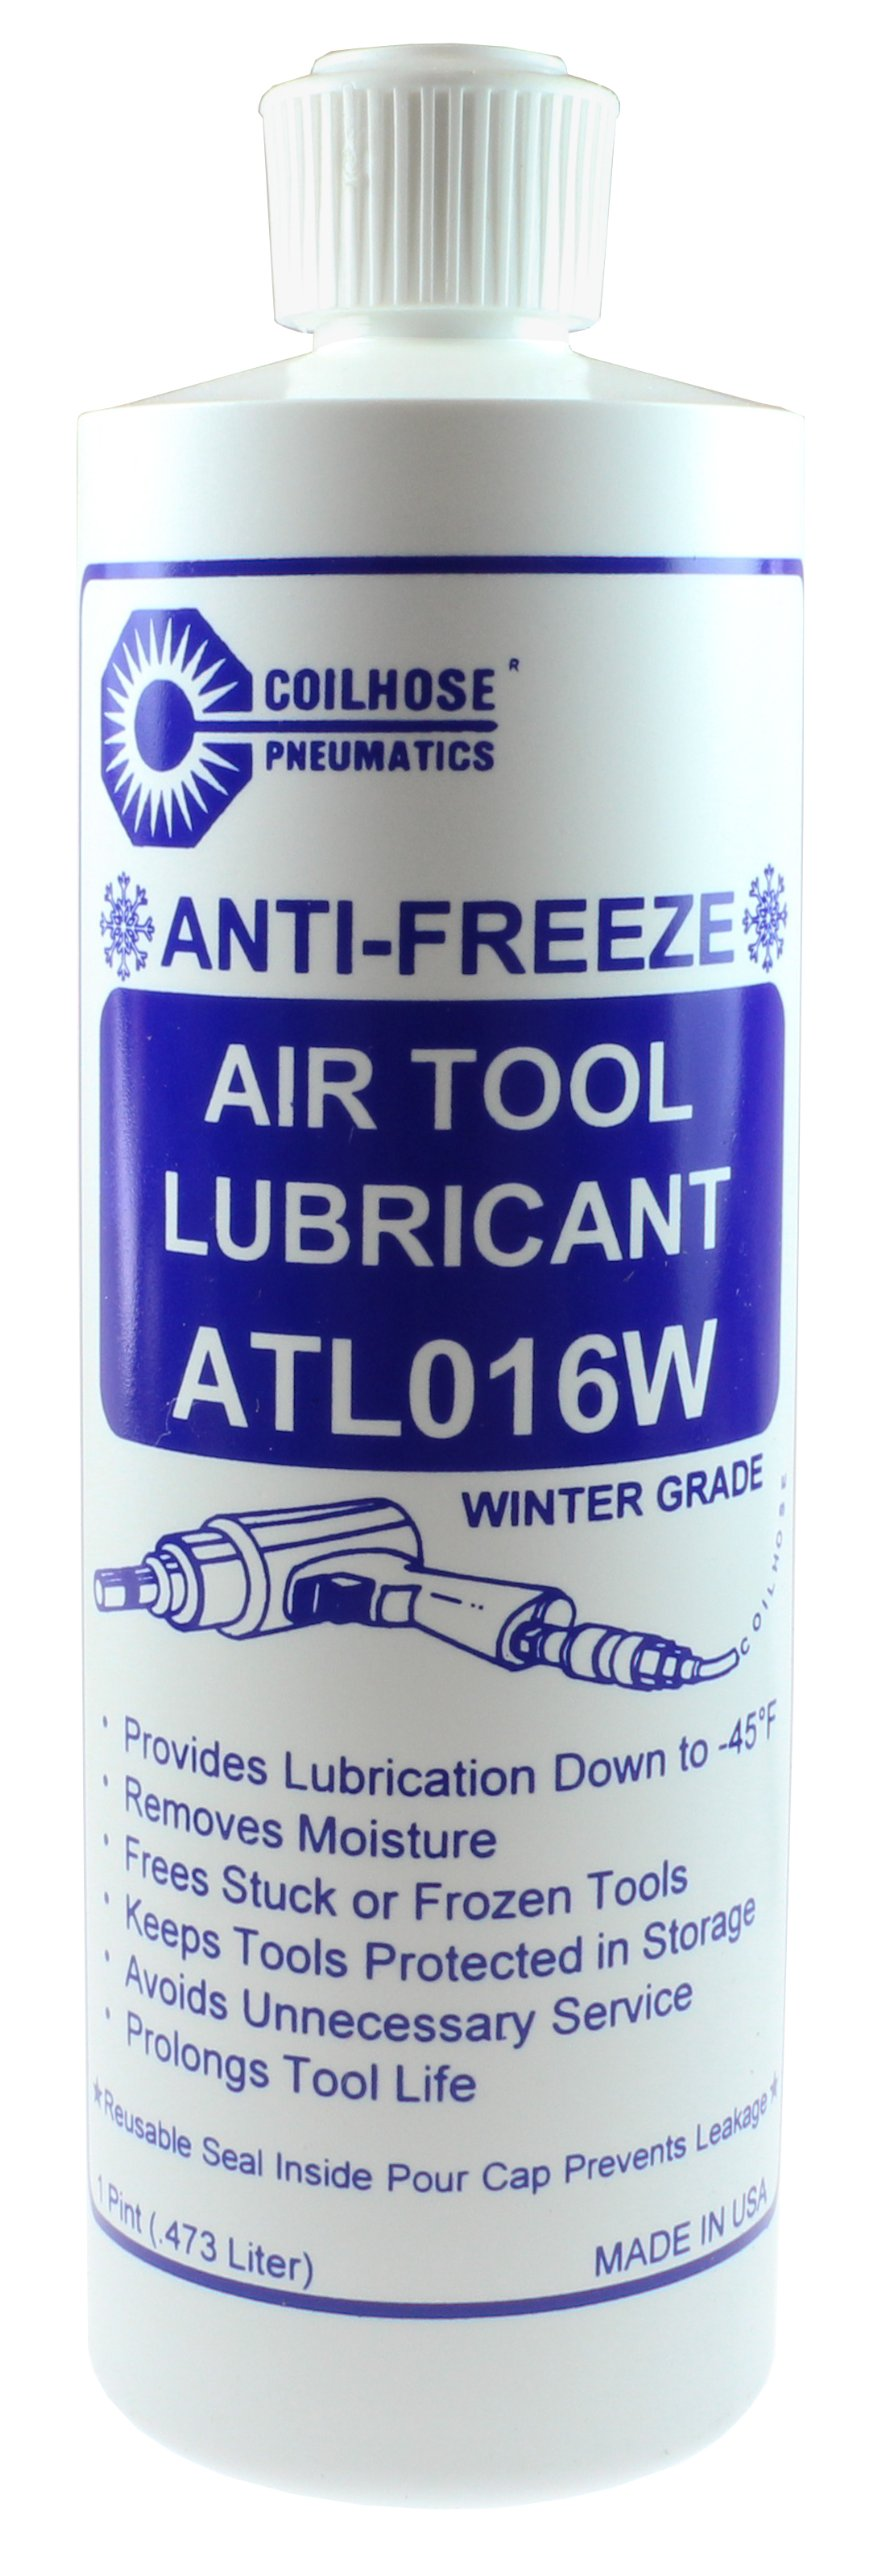 Coilhose Pneumatics ATL016W Wintergrade Air Tool Lubricant, 16-Ounce Bottle